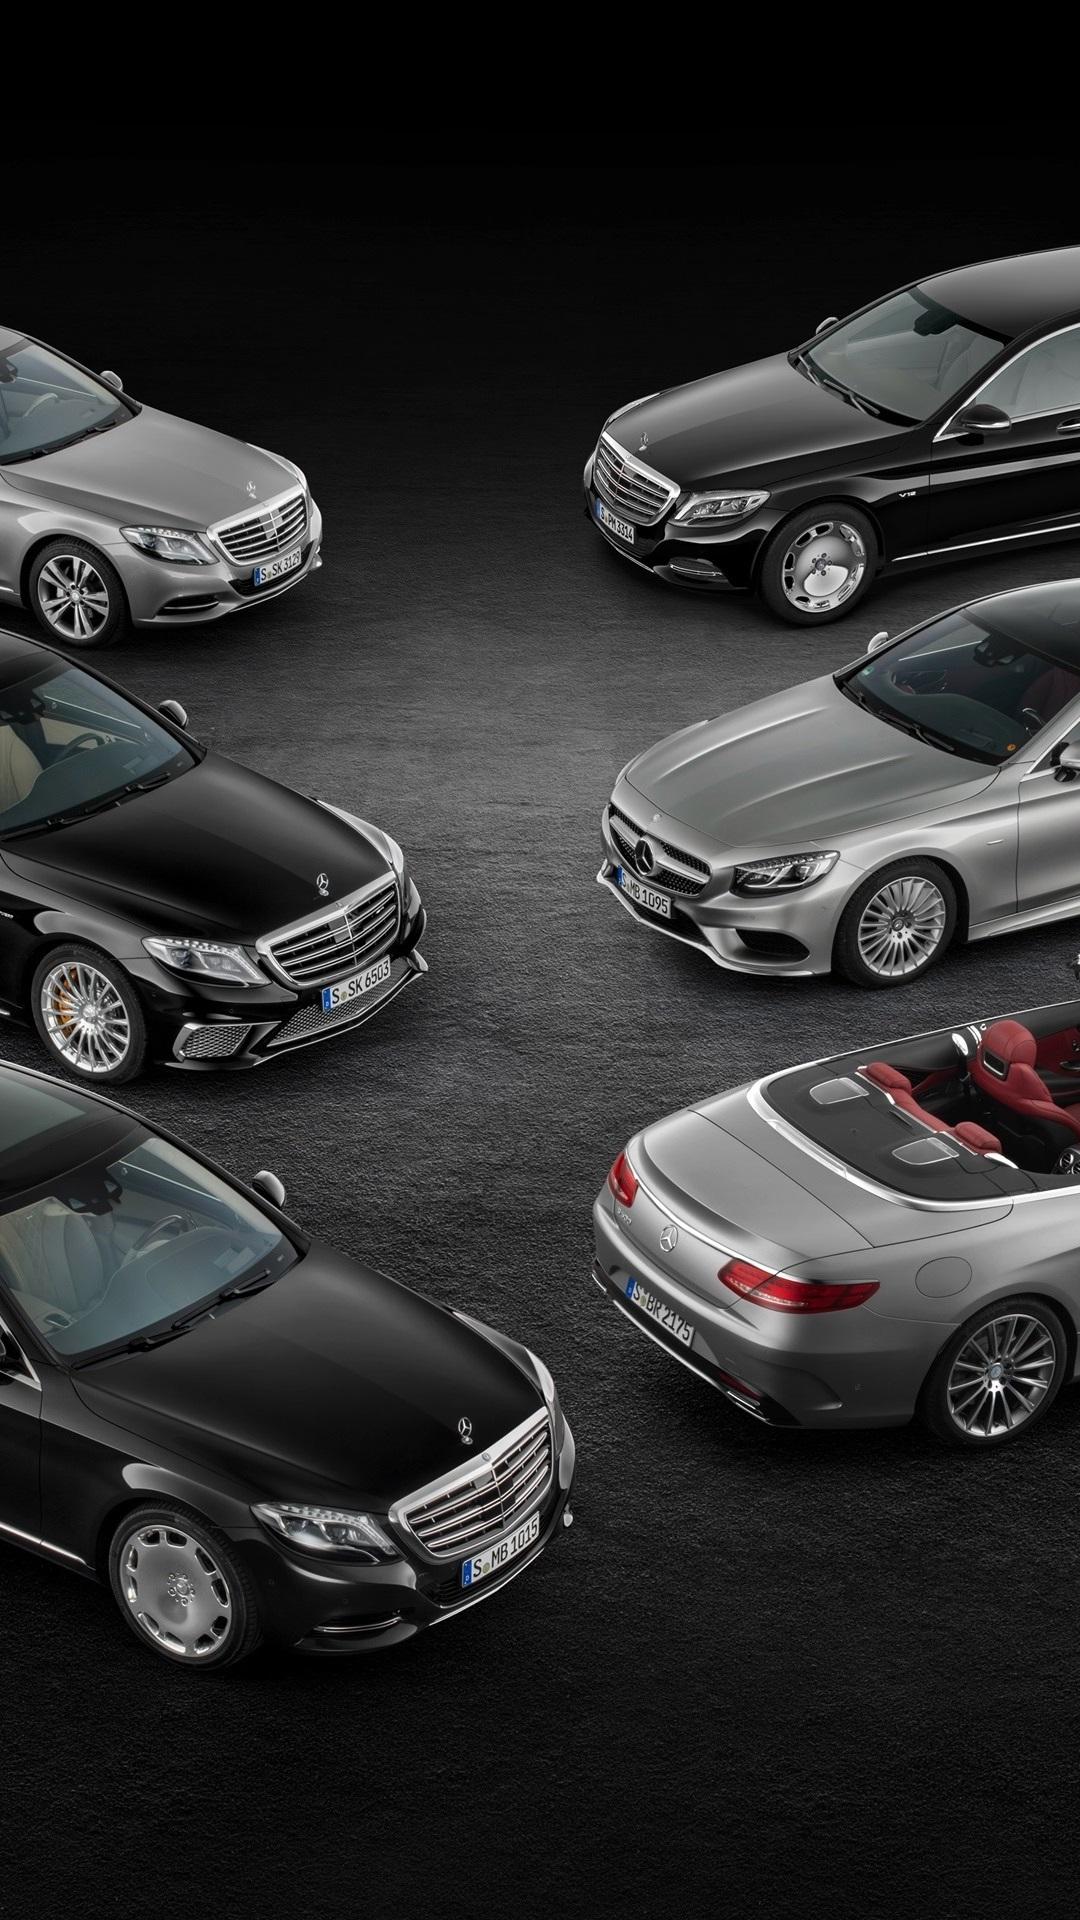 2015 Mercedes Benz S Class Cars 1080x1920 Iphone 8 7 6 6s